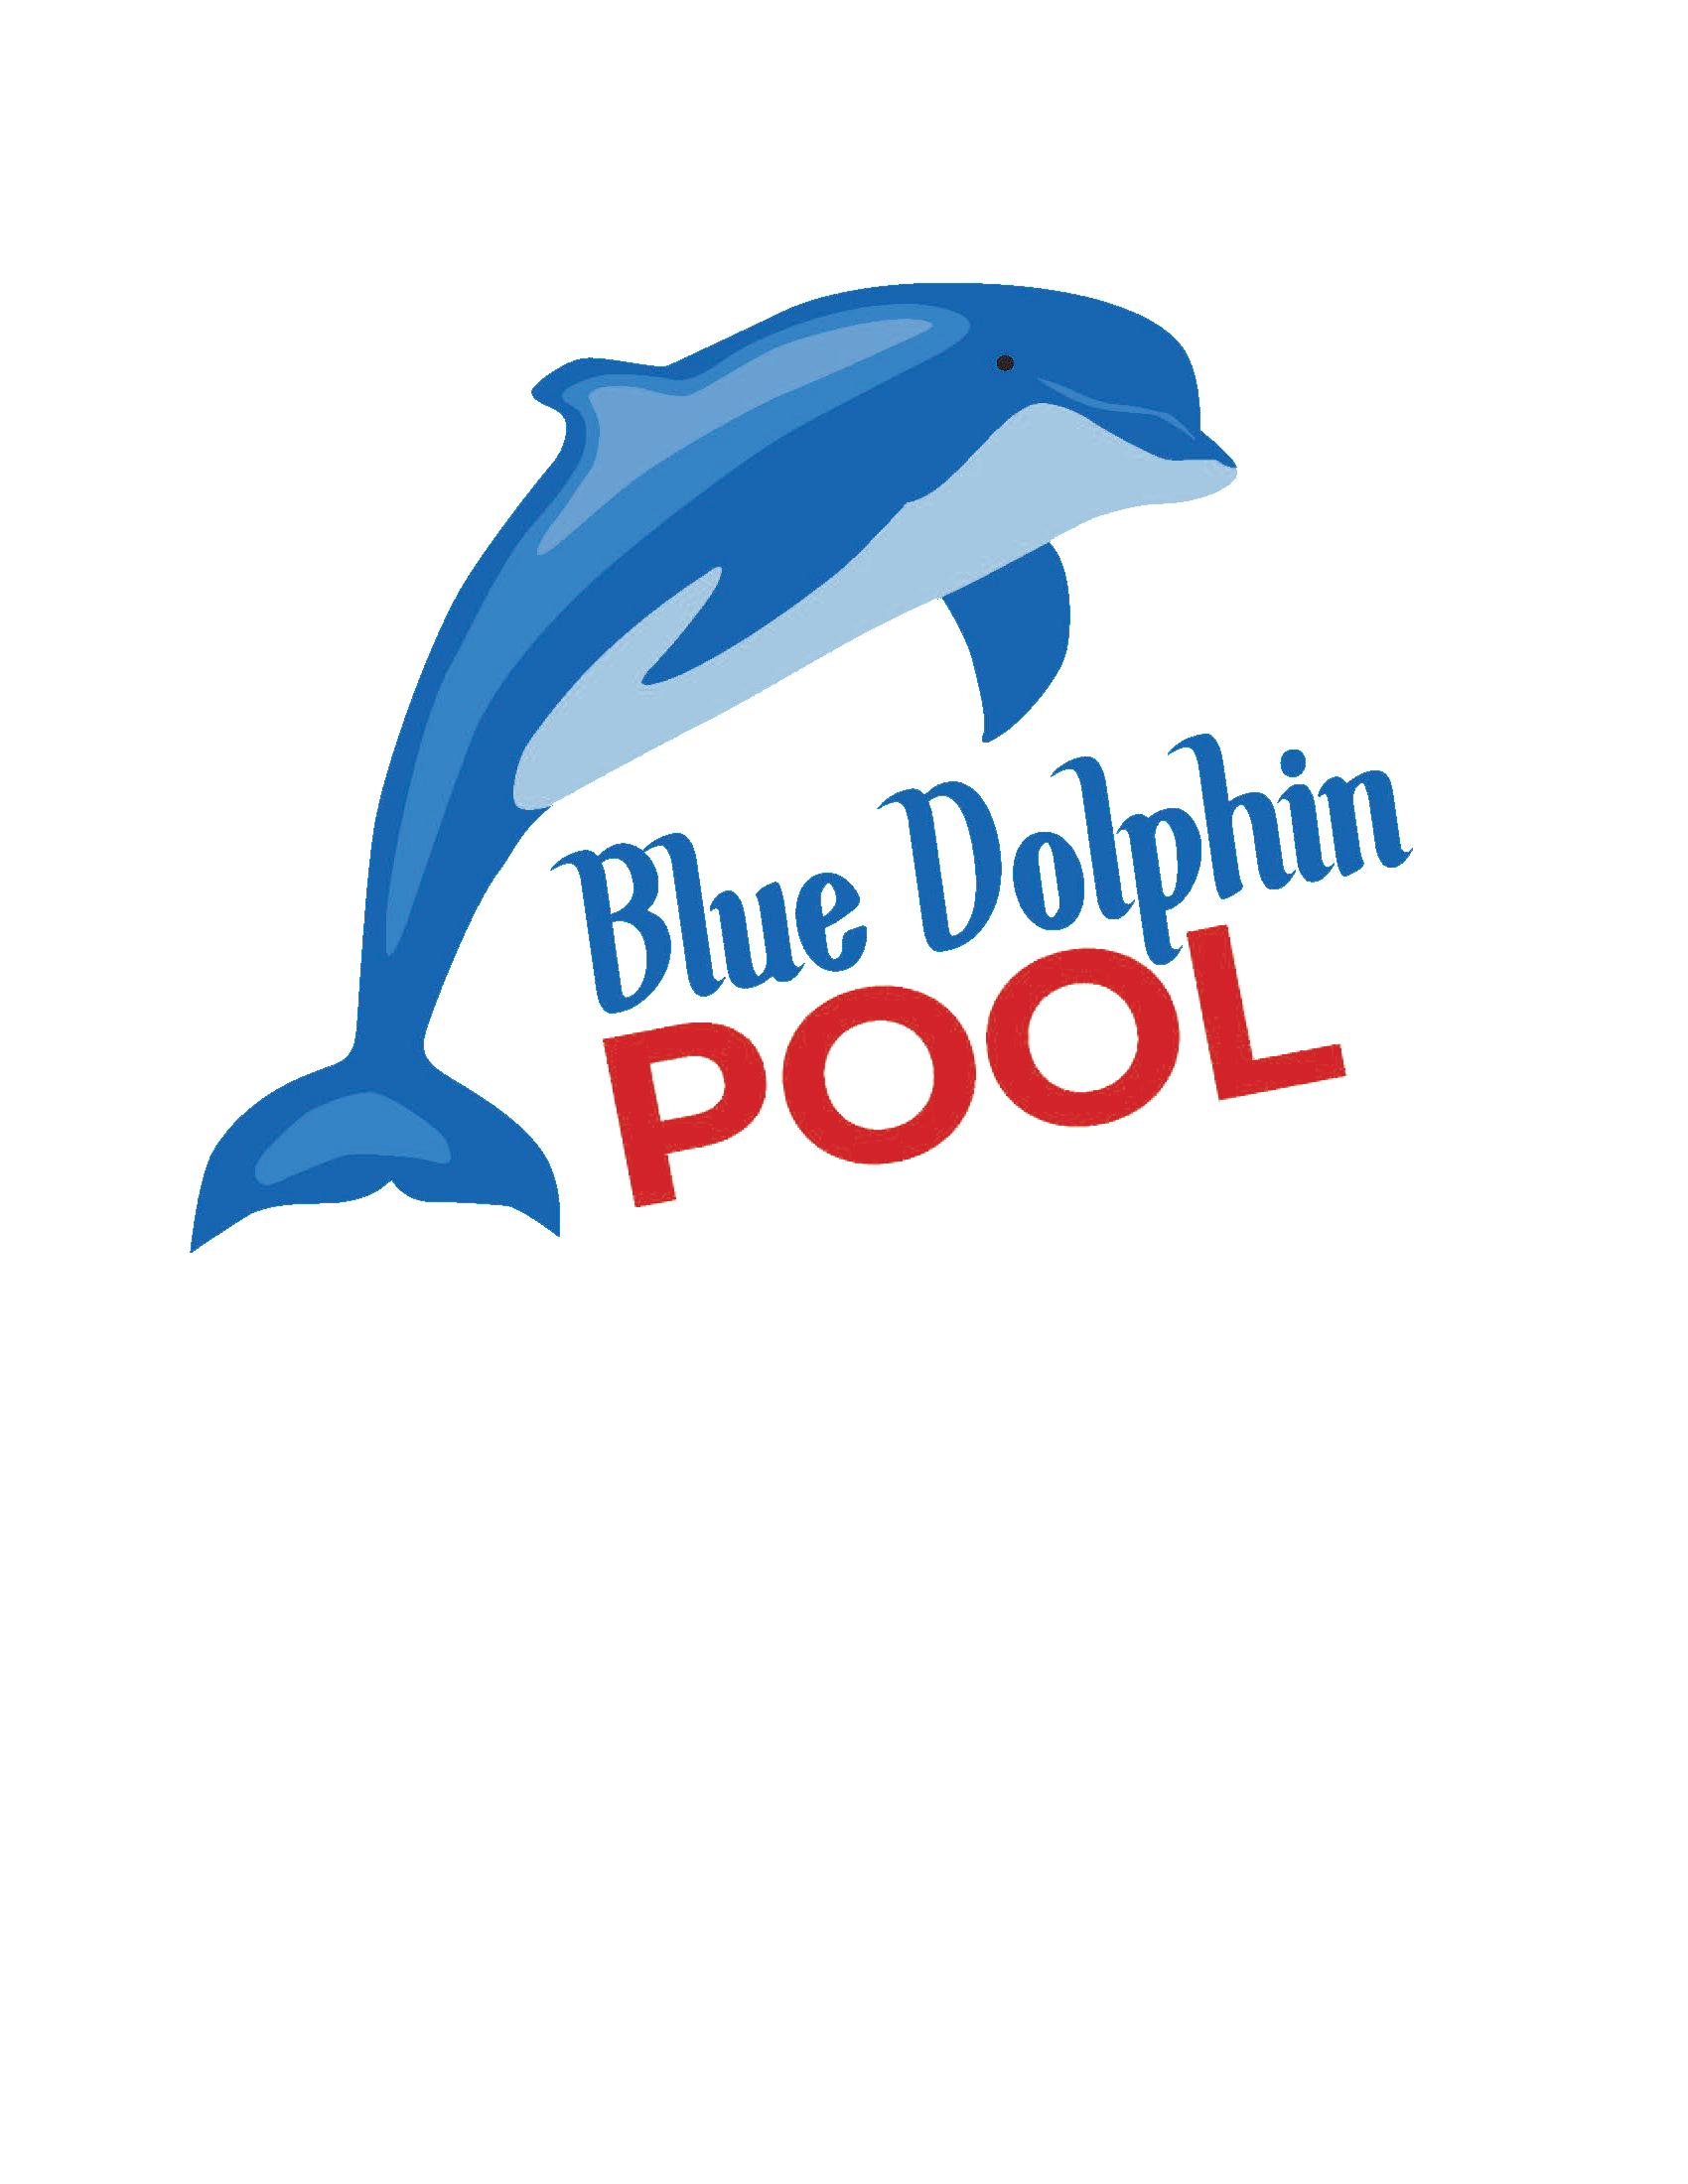 Blue Dolphin Pool Logo